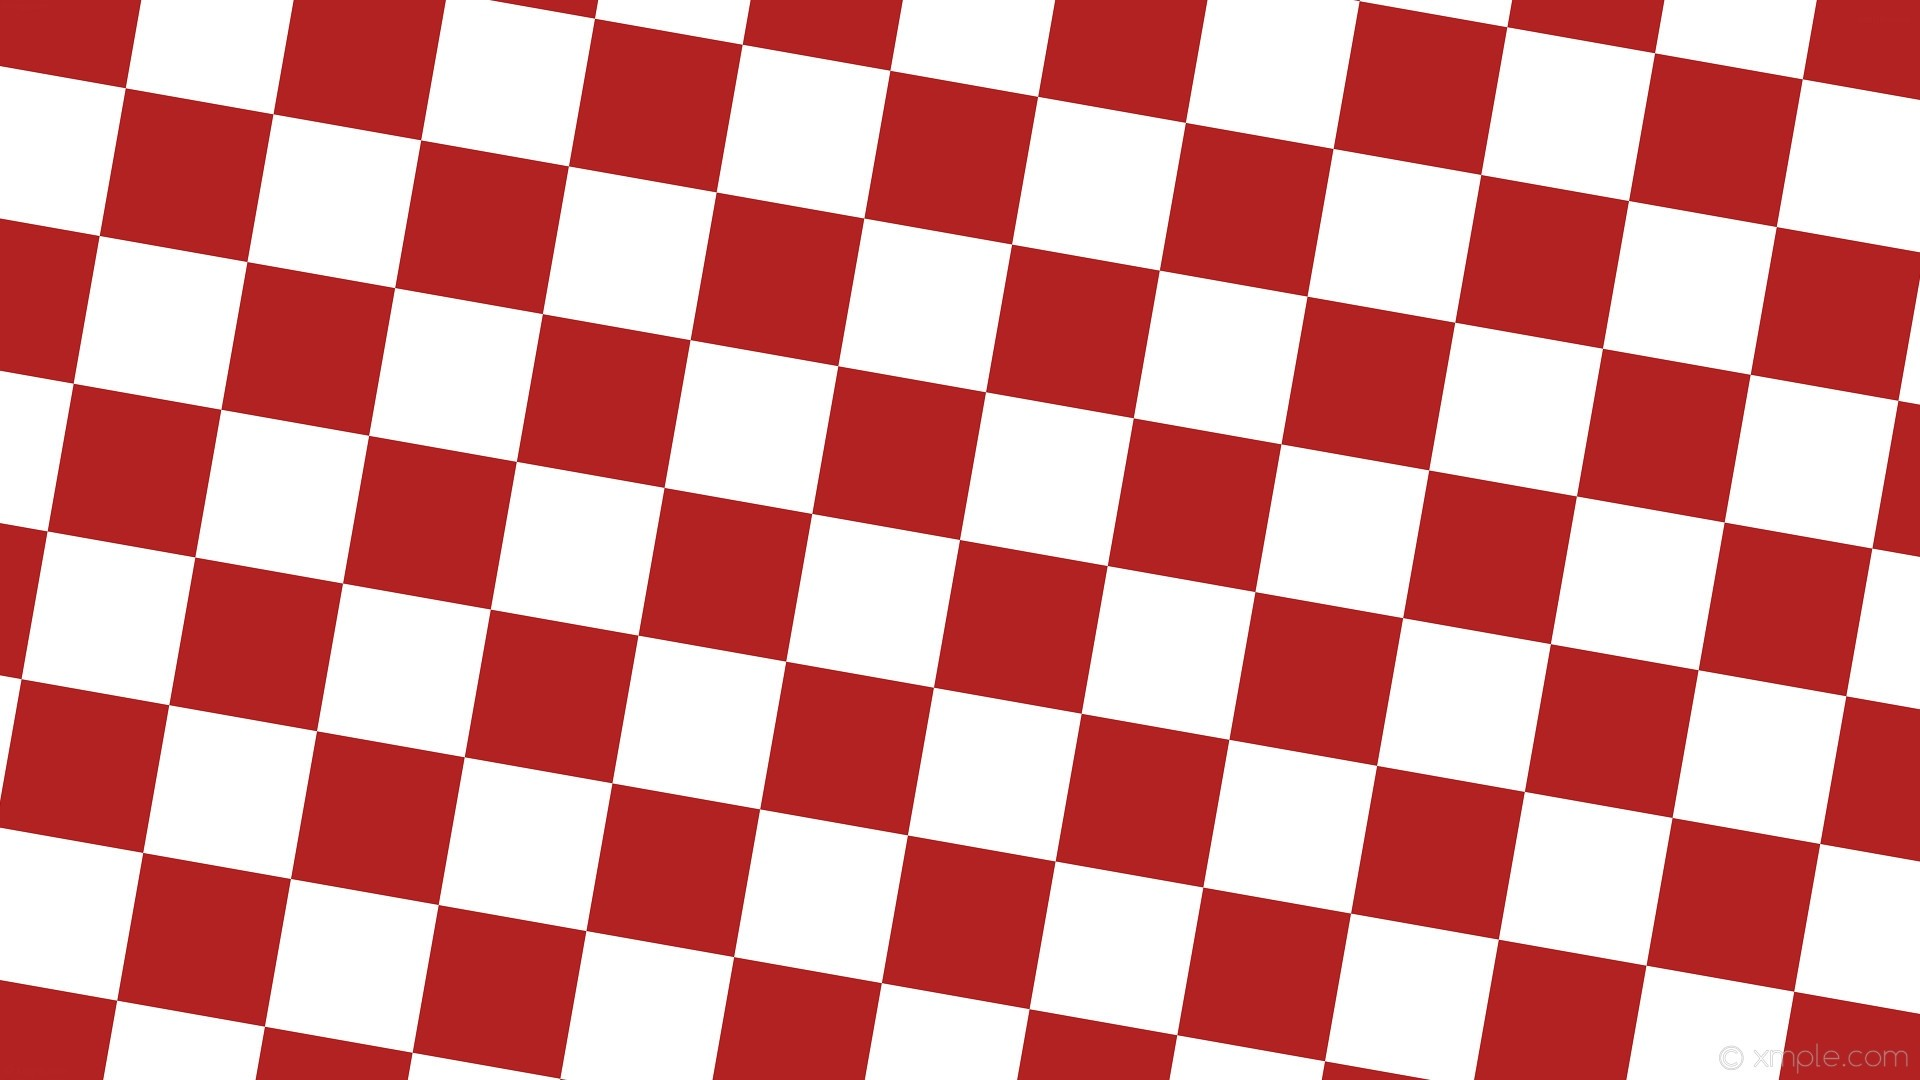 Checkerboard Wallpaper image hd